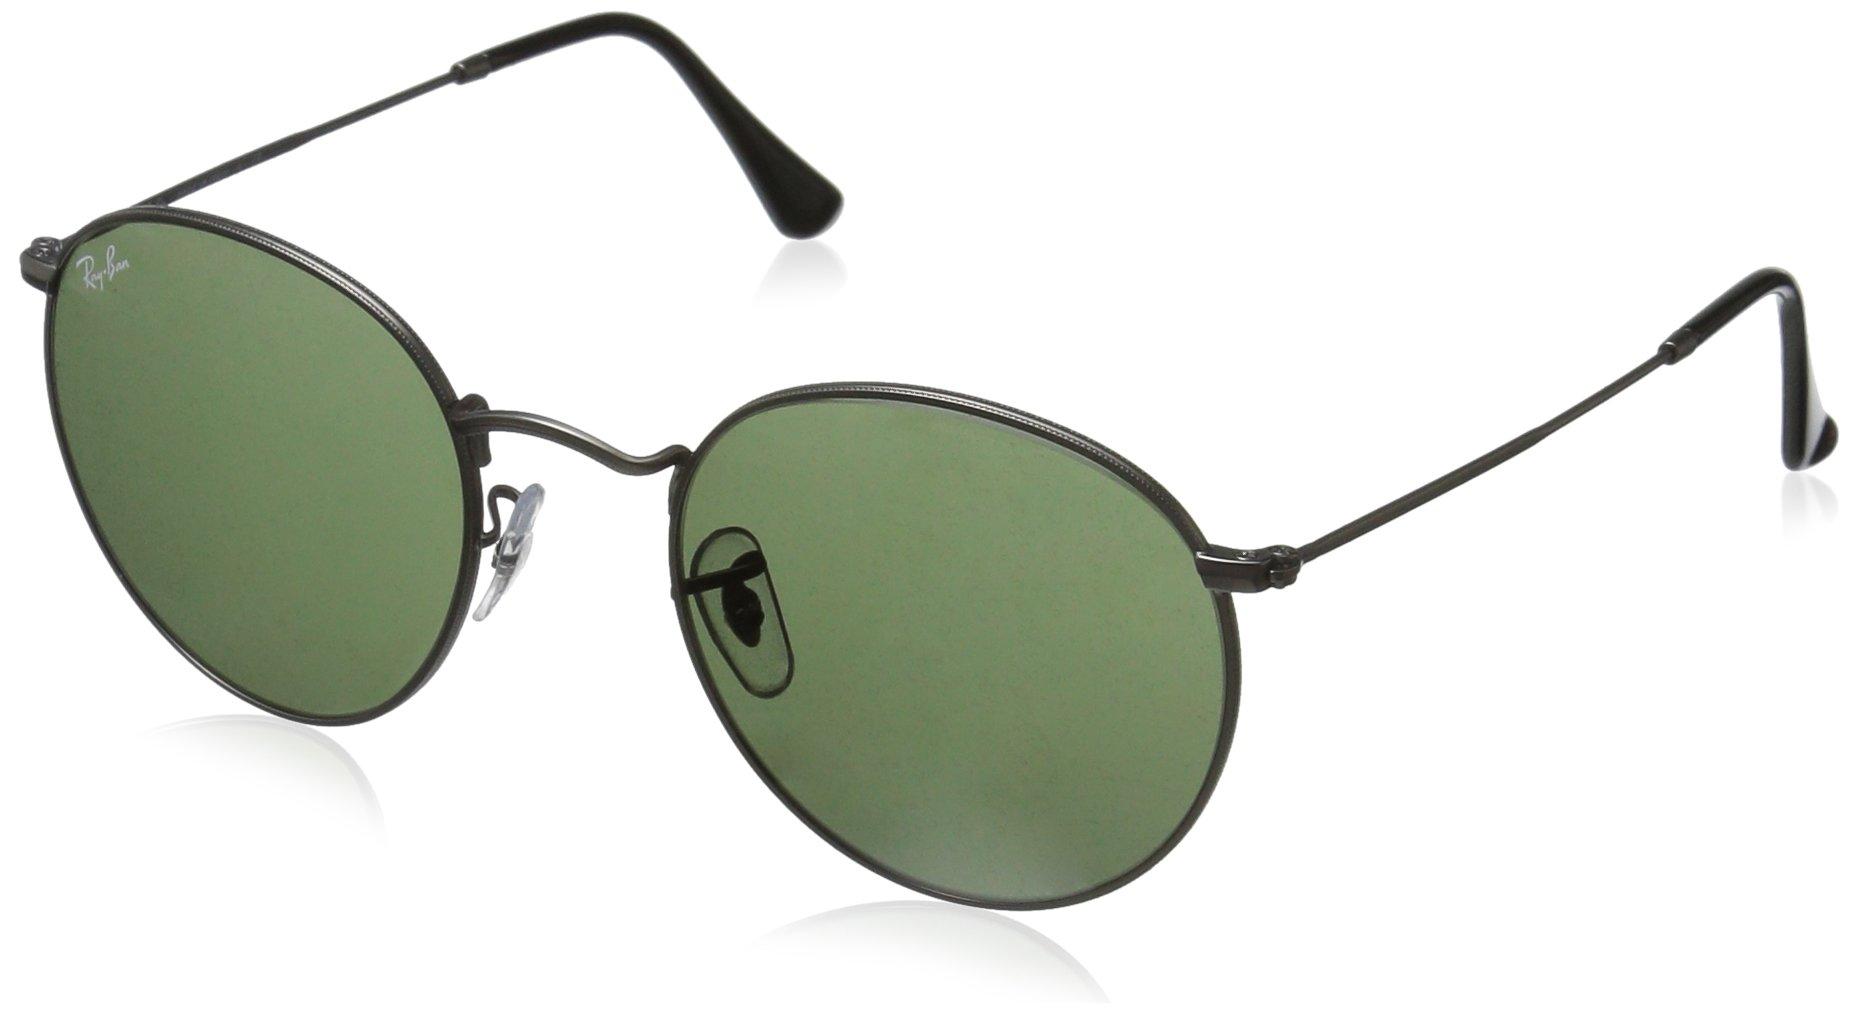 Ray-Ban Metal Round Sunglasses, Matte Gunmetal, 53 mm by Ray-Ban